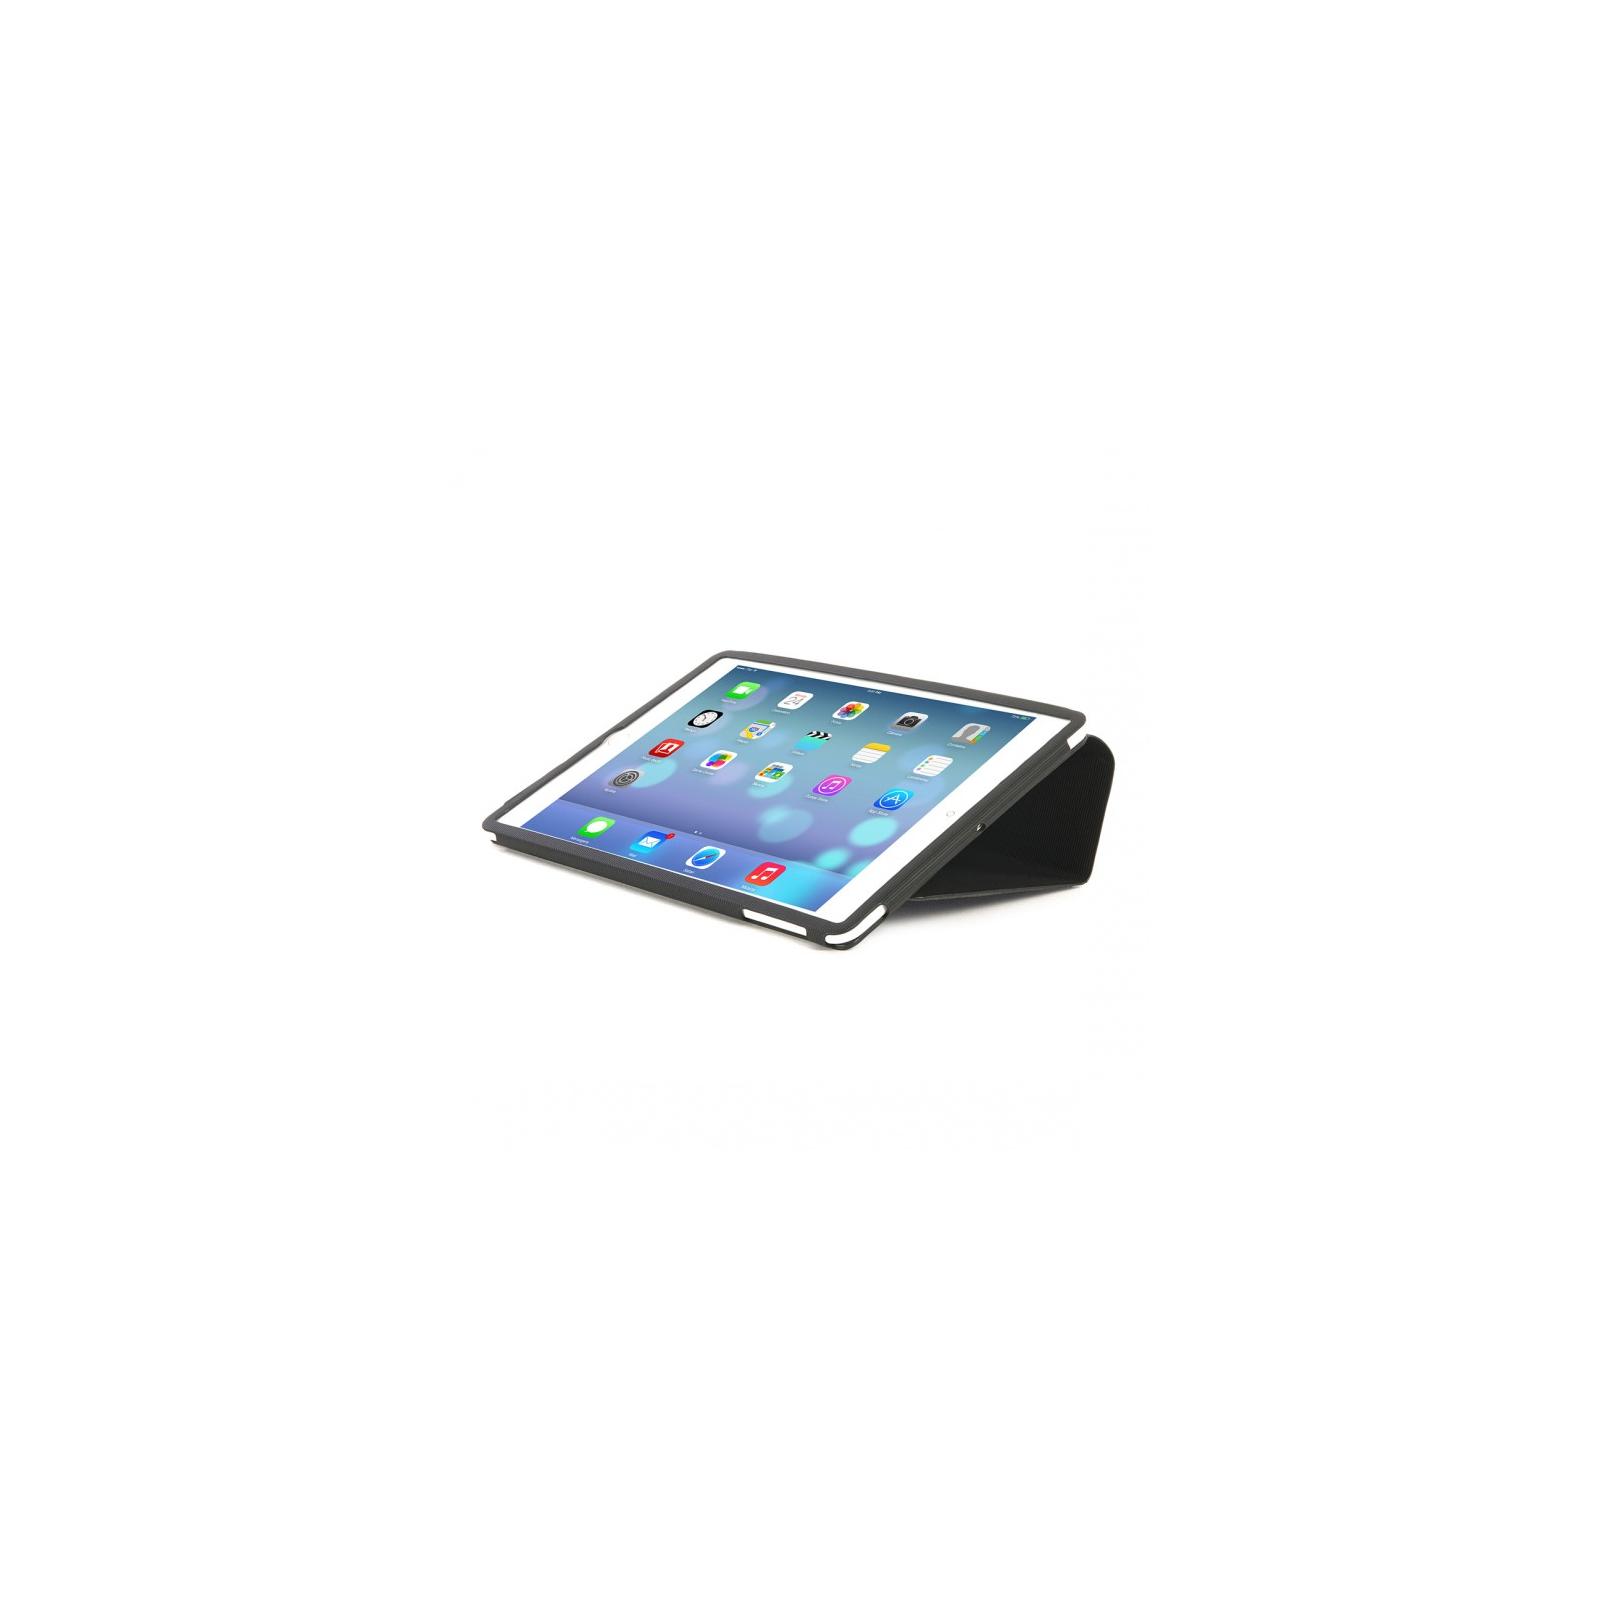 Чехол для планшета Tucano iPad Air Fresco Black (IPD5F) изображение 5